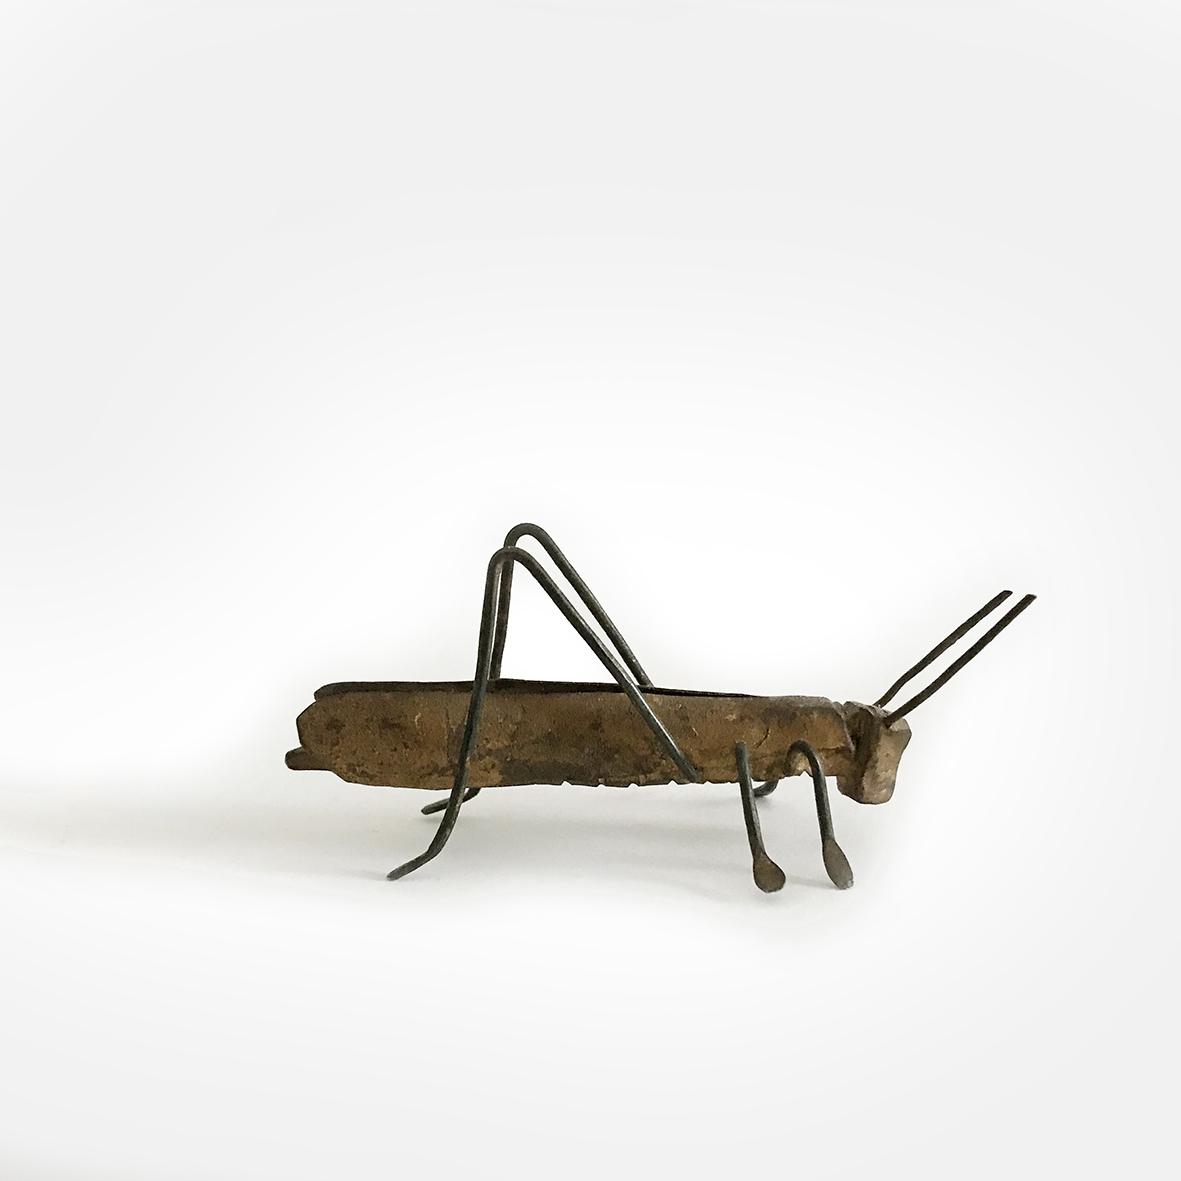 Grasshopper | bronze | Japan | basedonart gallery